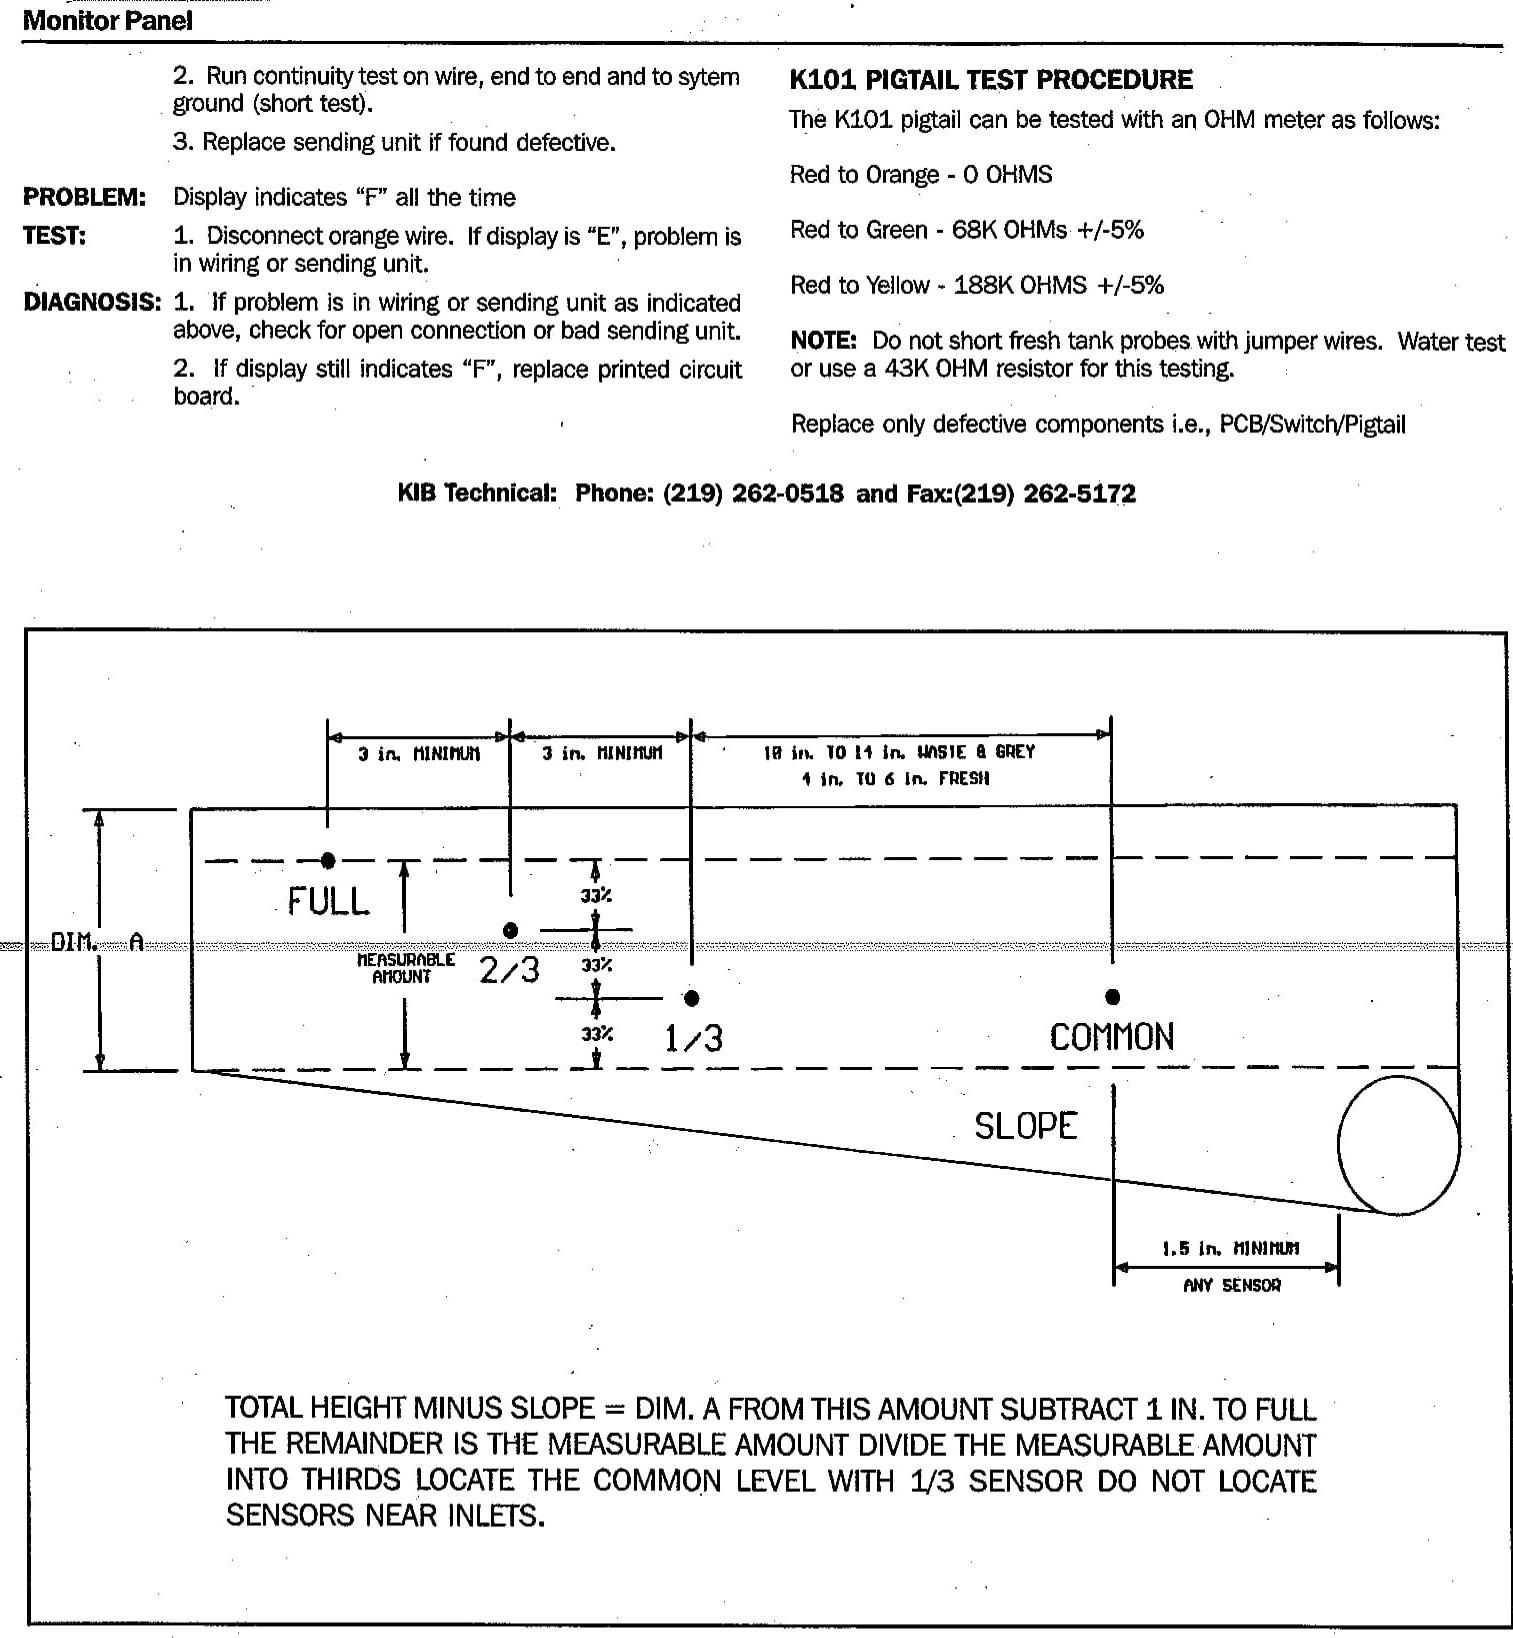 Kib Micro Monitor Panel Instructions